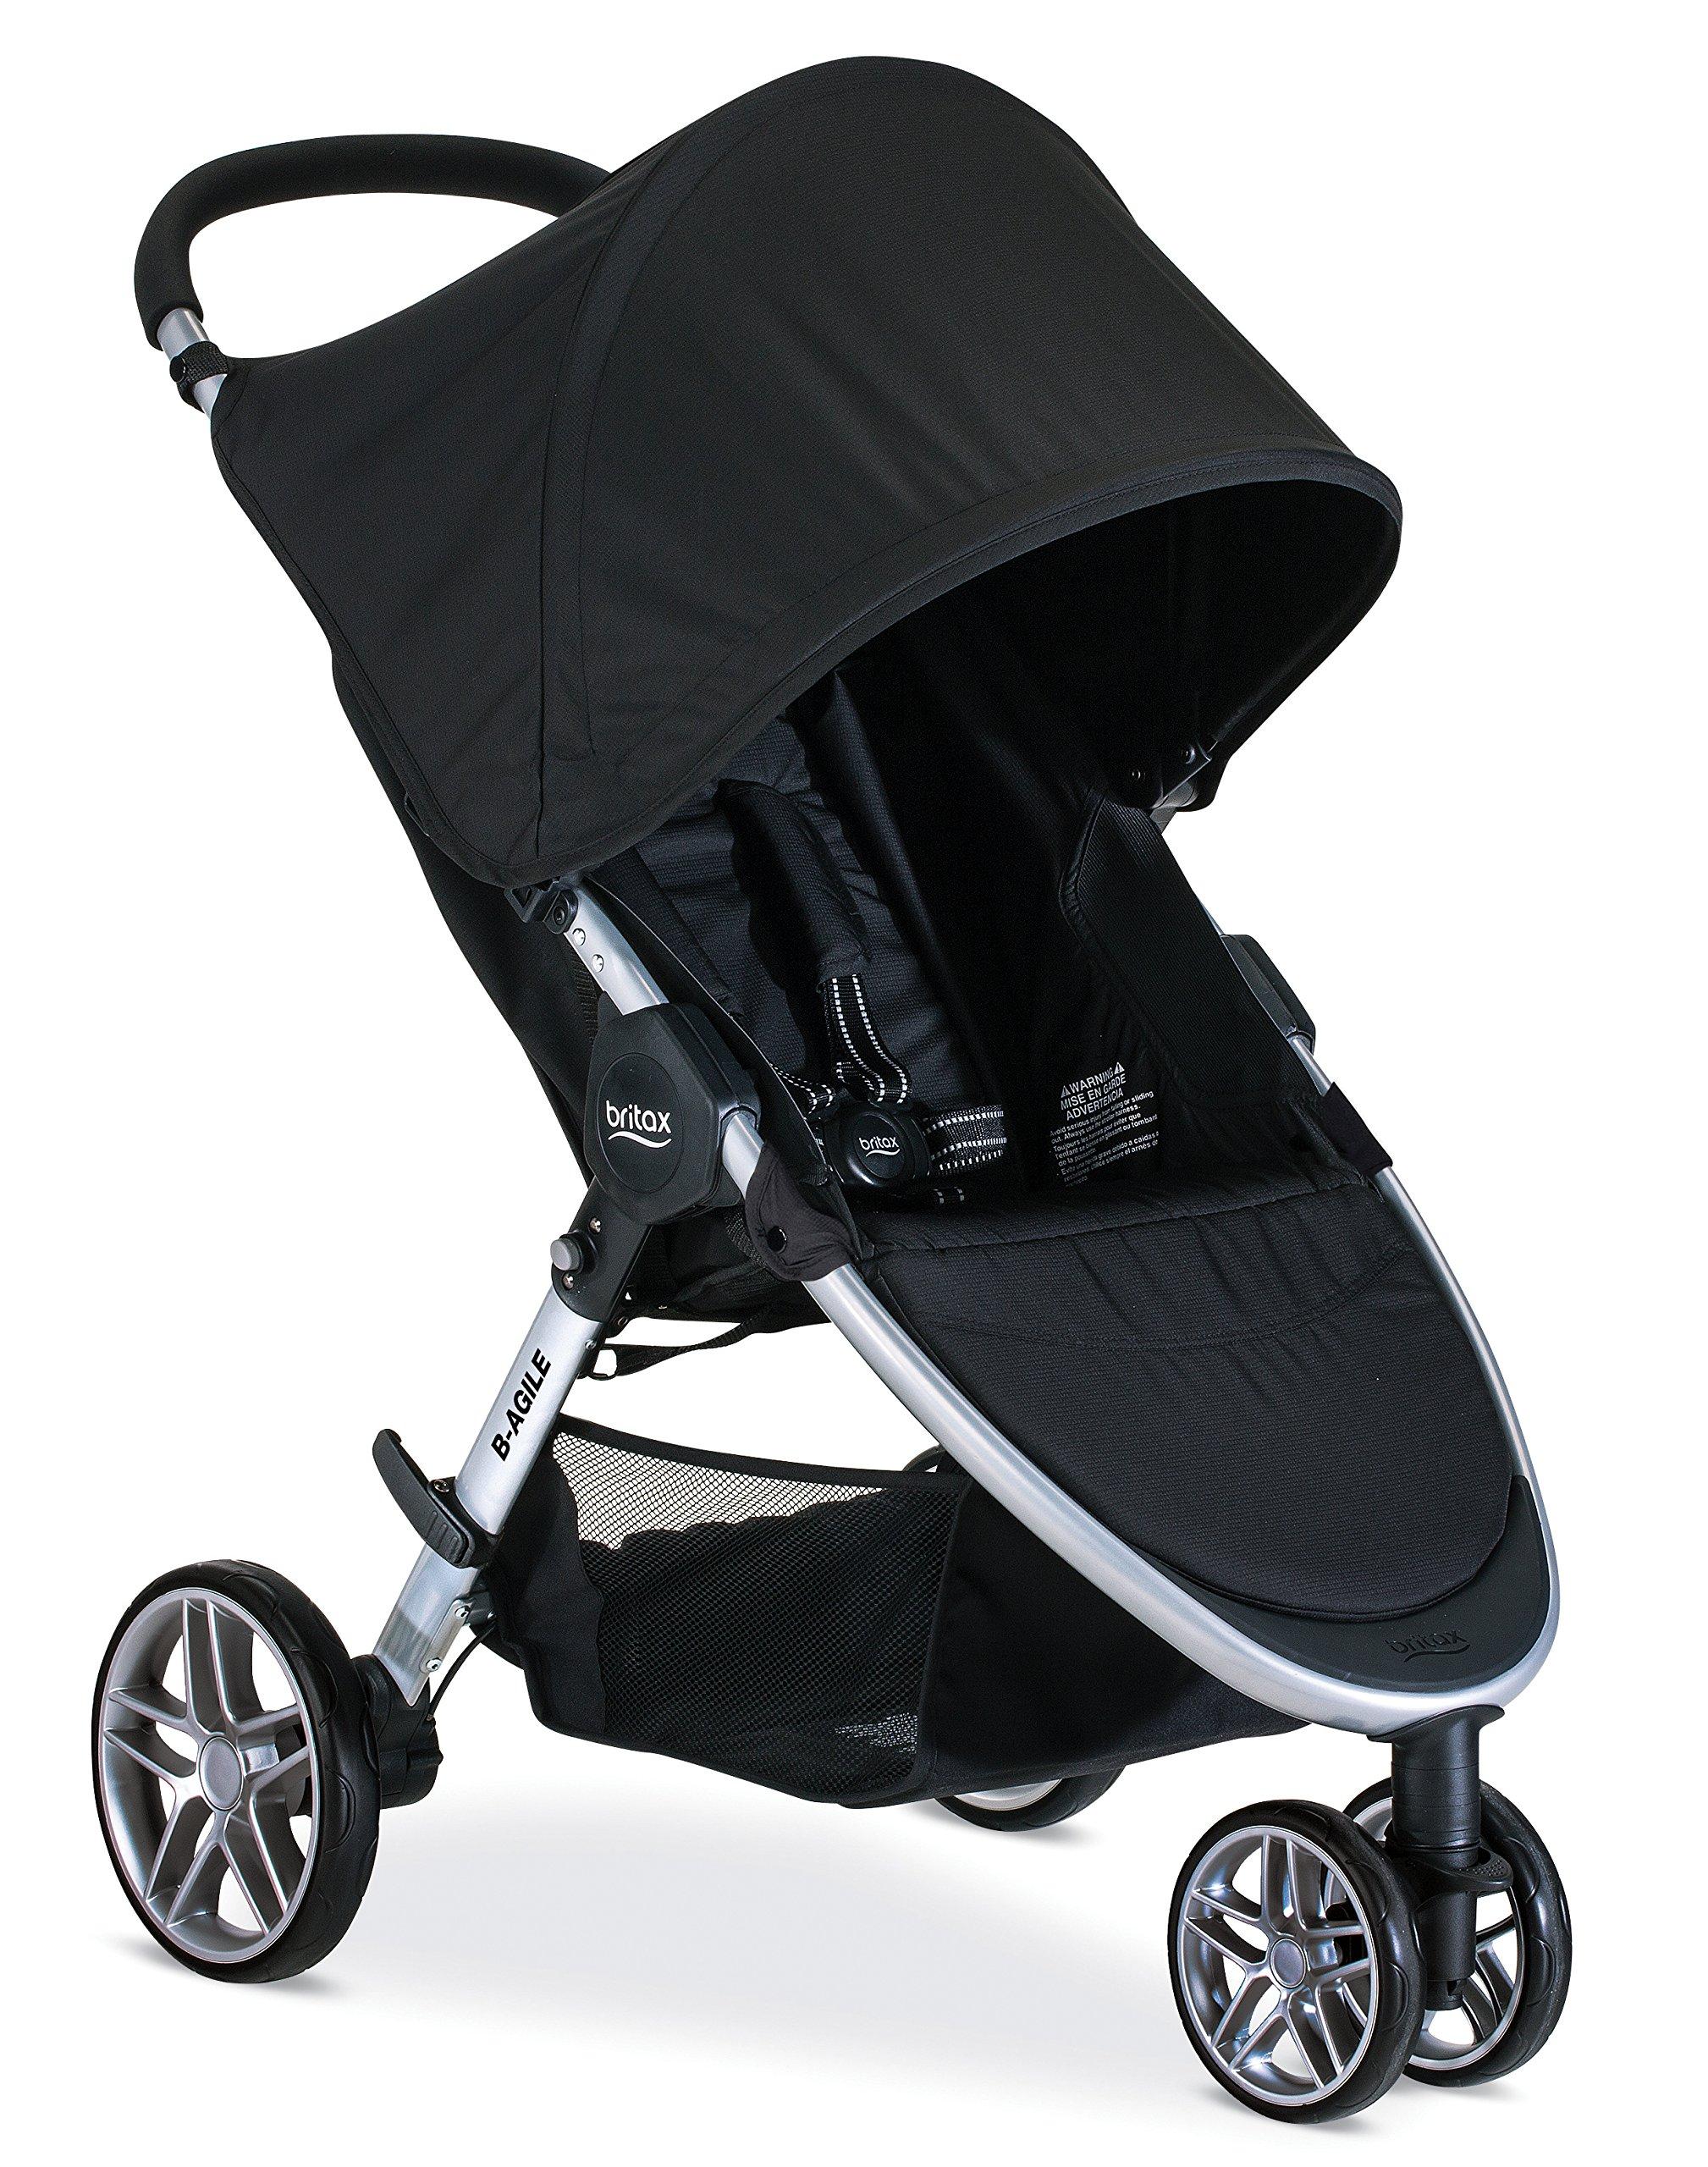 Amazon.com : Britax Stroller Board, Black : Baby Stroller ...